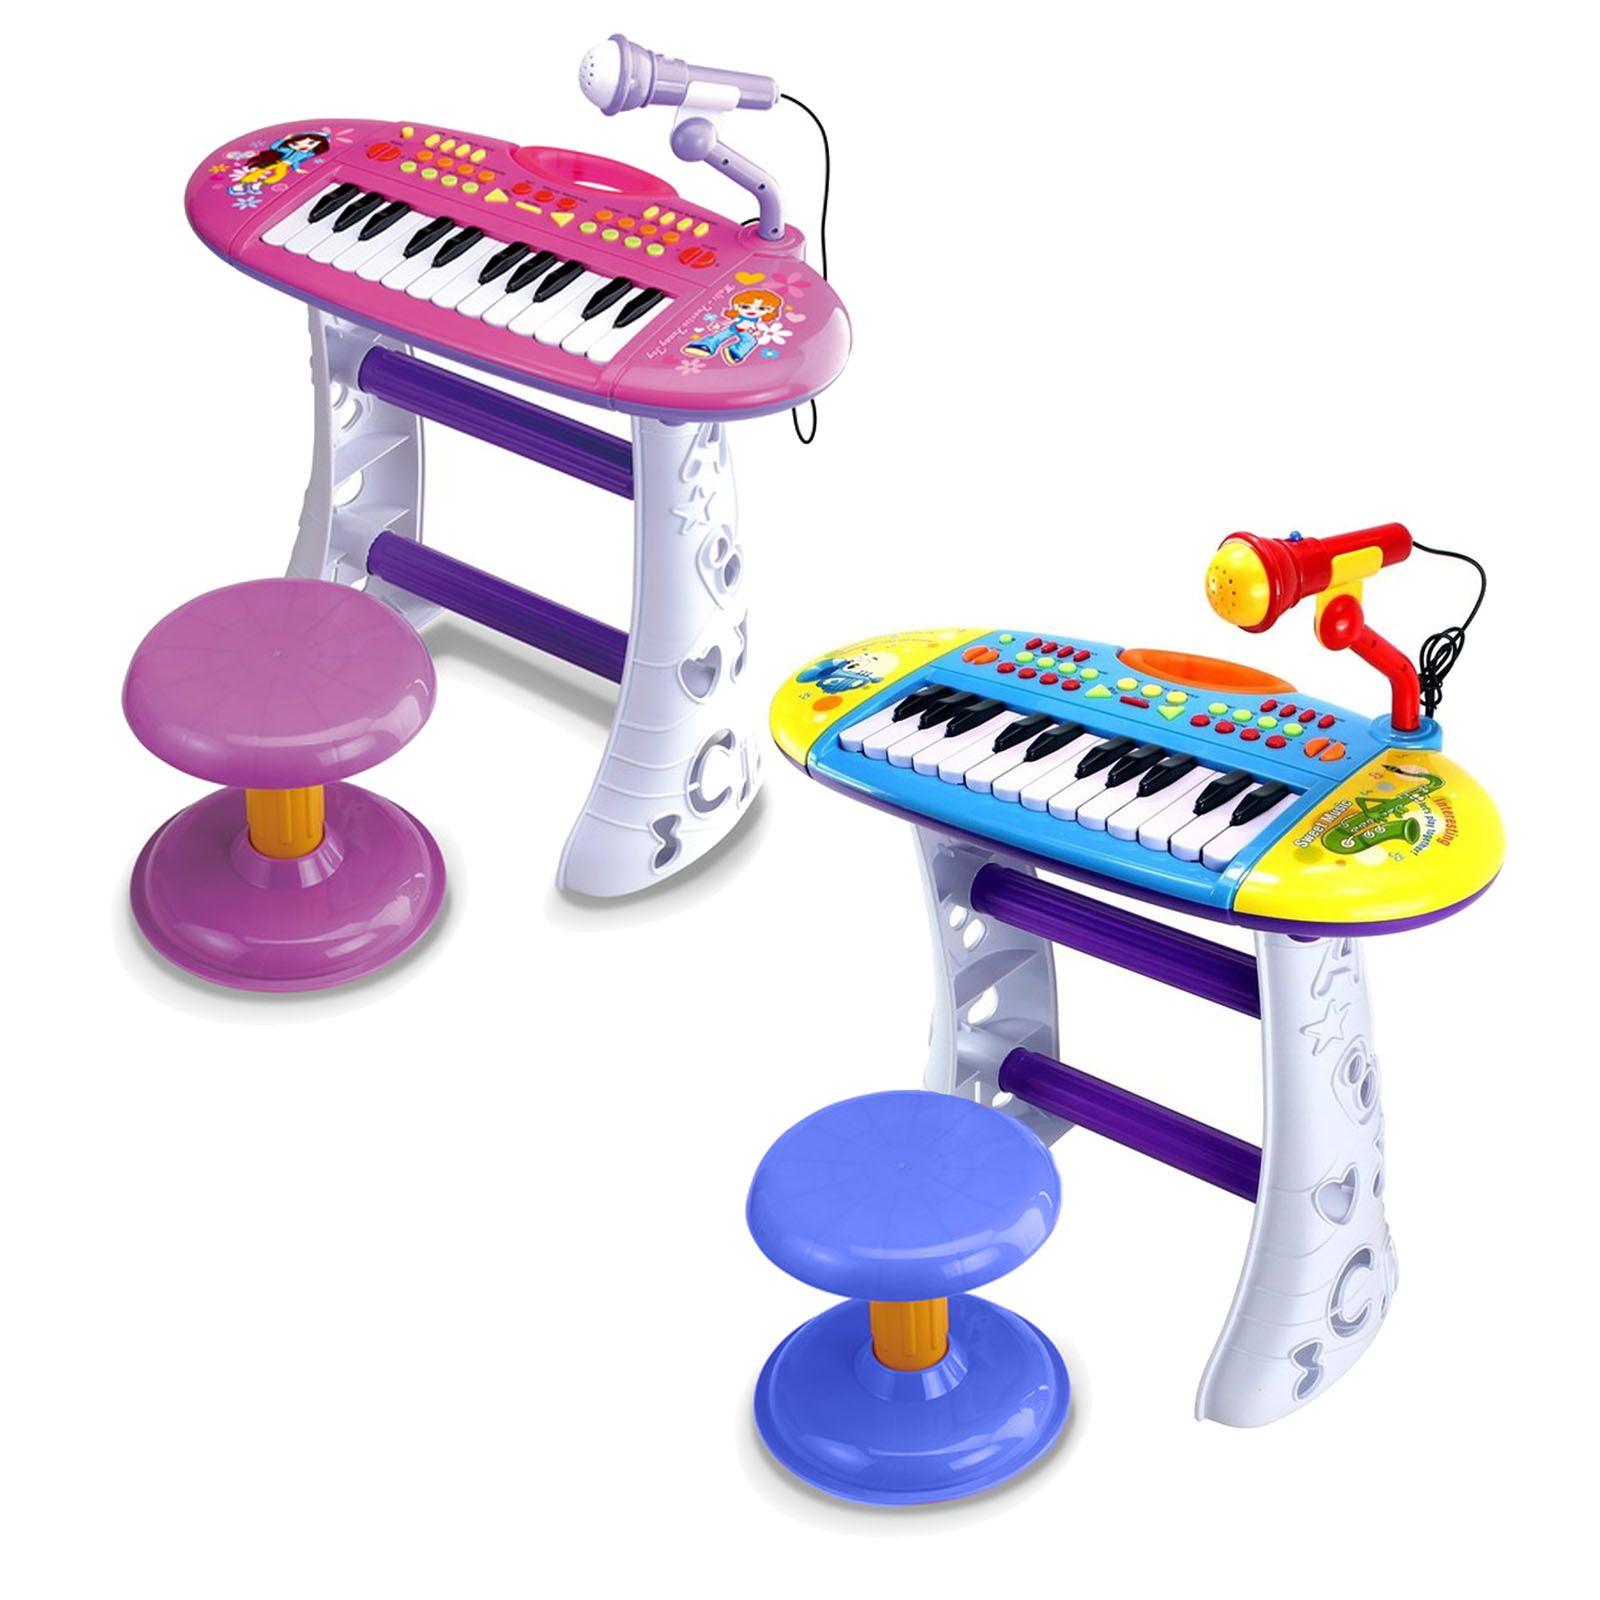 Детское пианино Portable Piano (свет, звук)